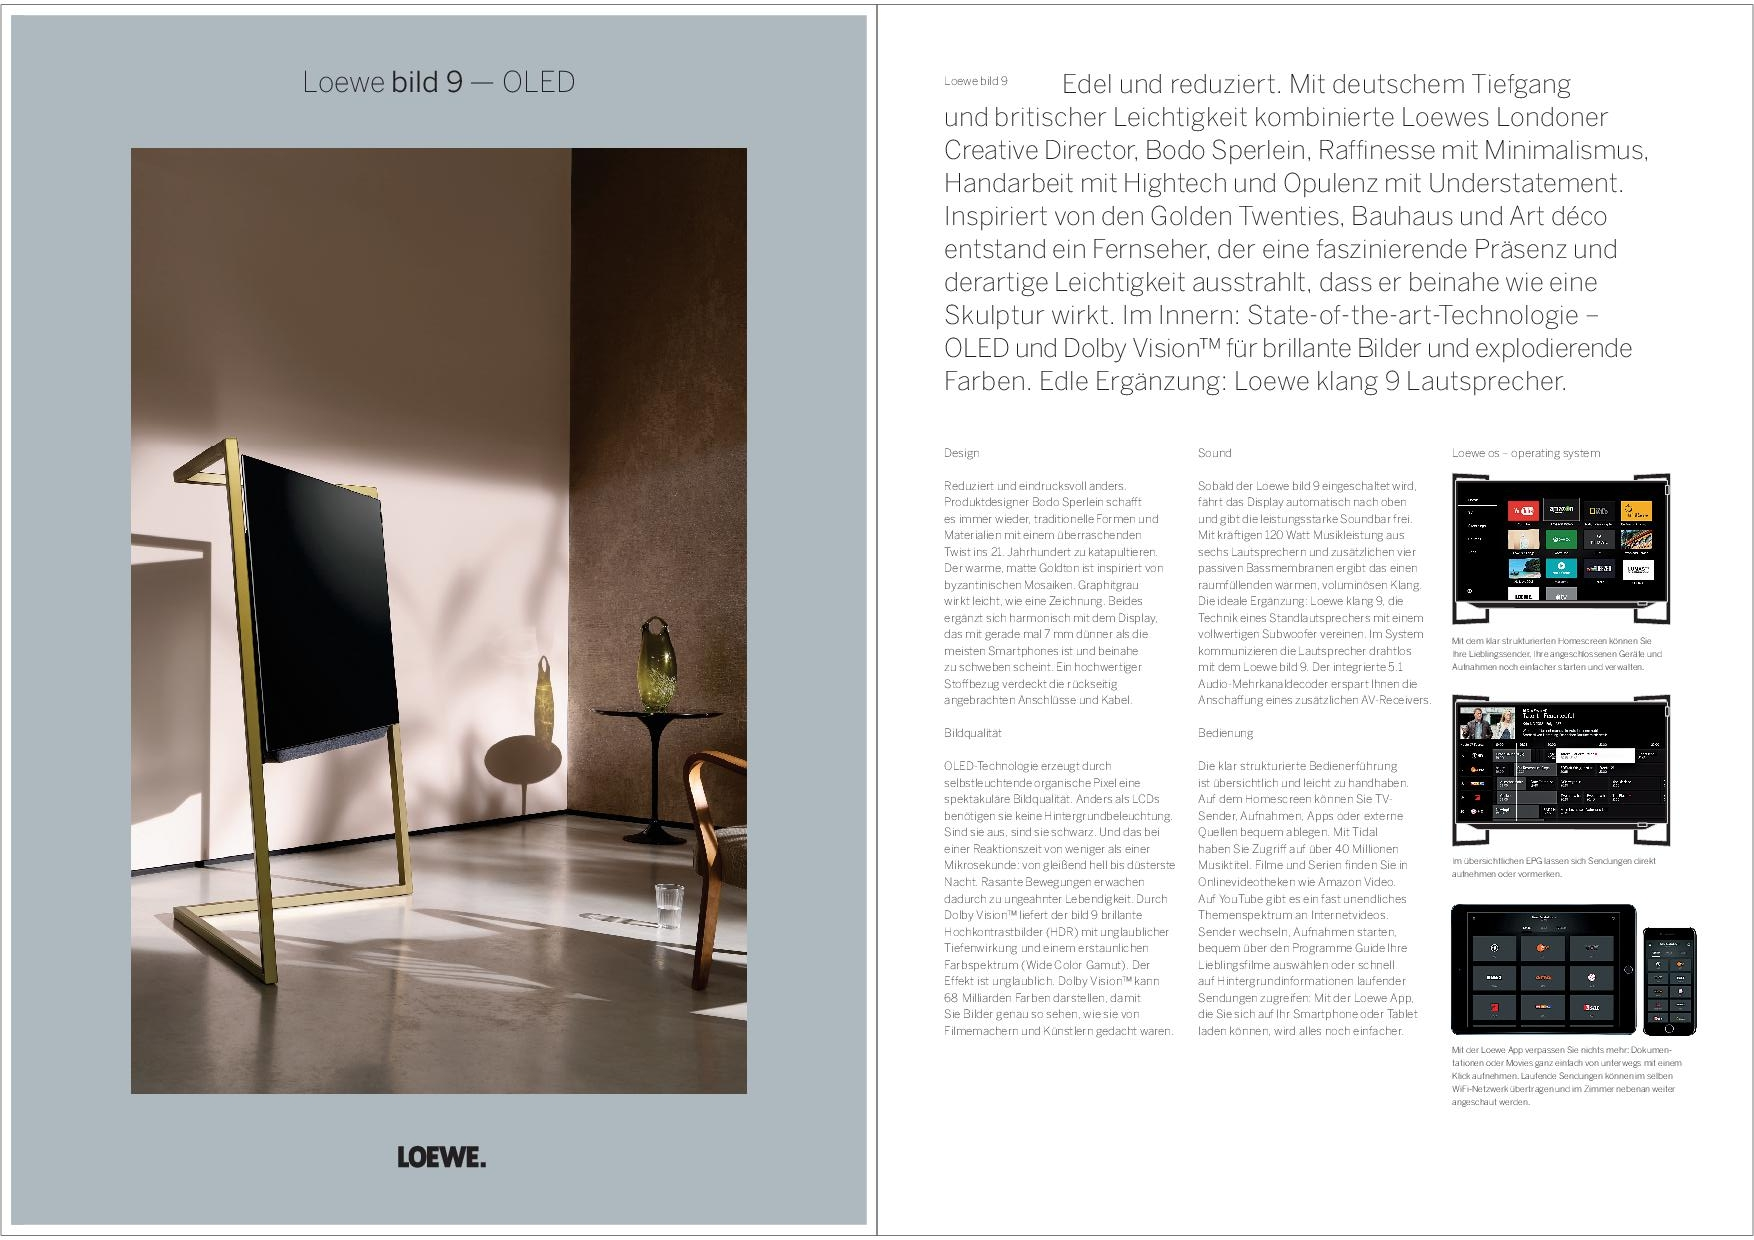 Loewe Bild 9